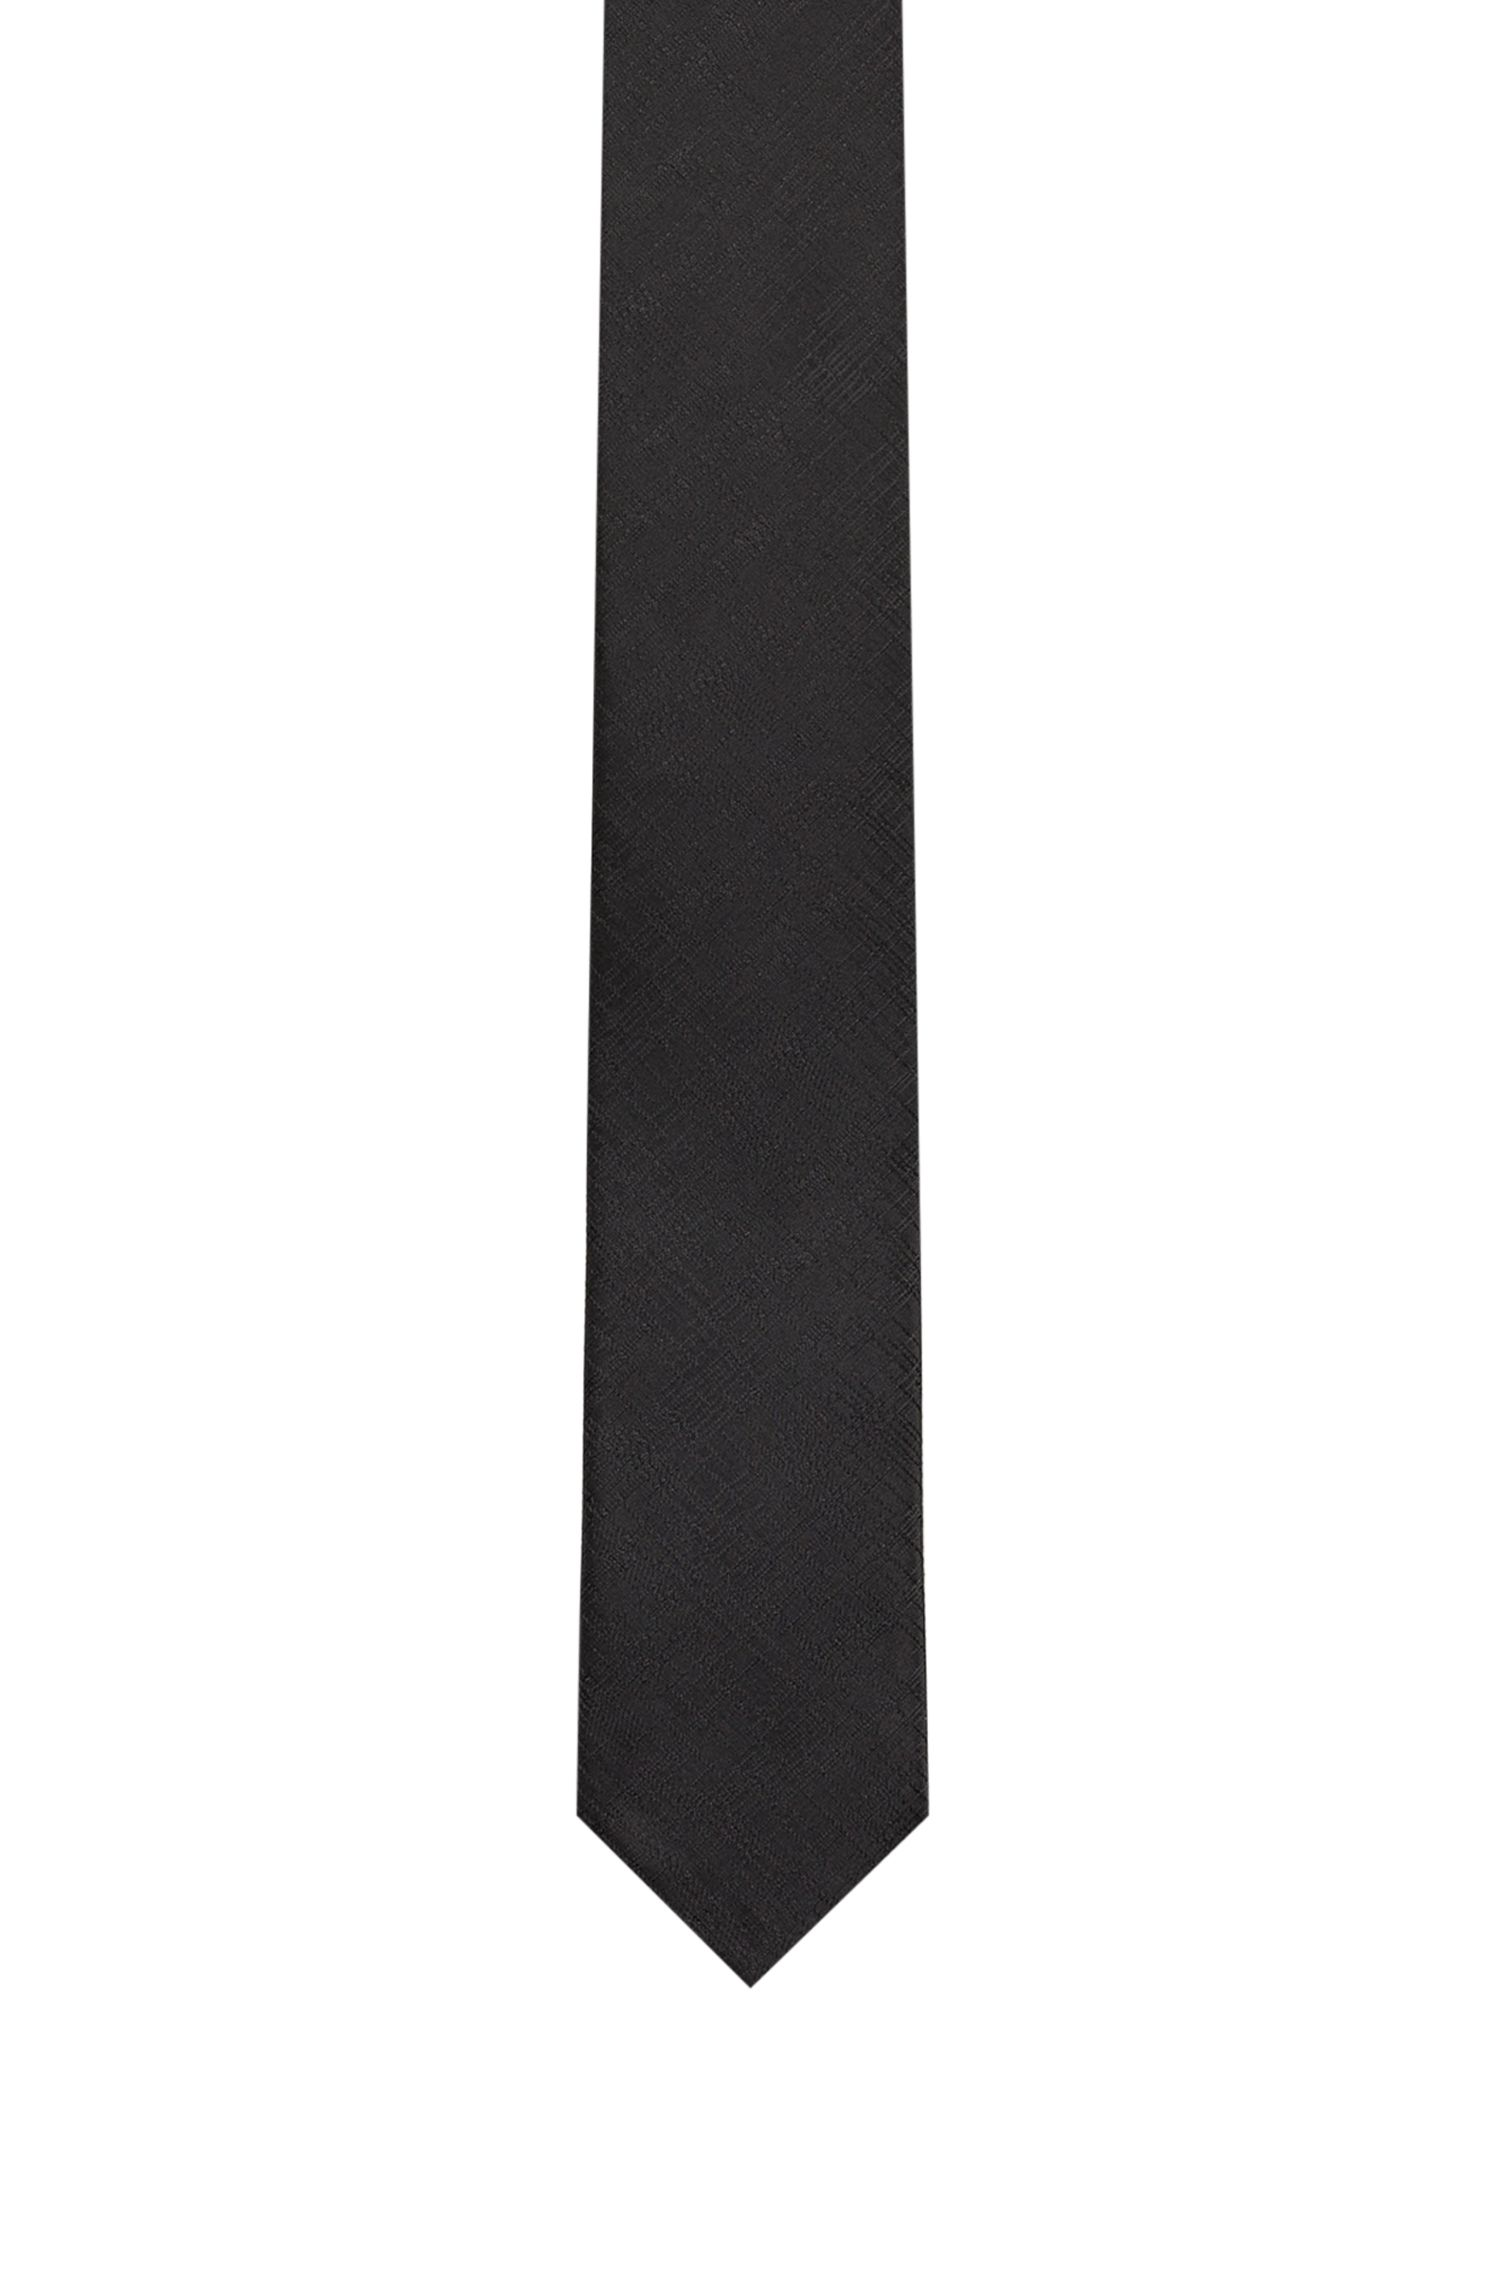 Krawatte aus Jacquard mit QR-Code-Motiv, Schwarz